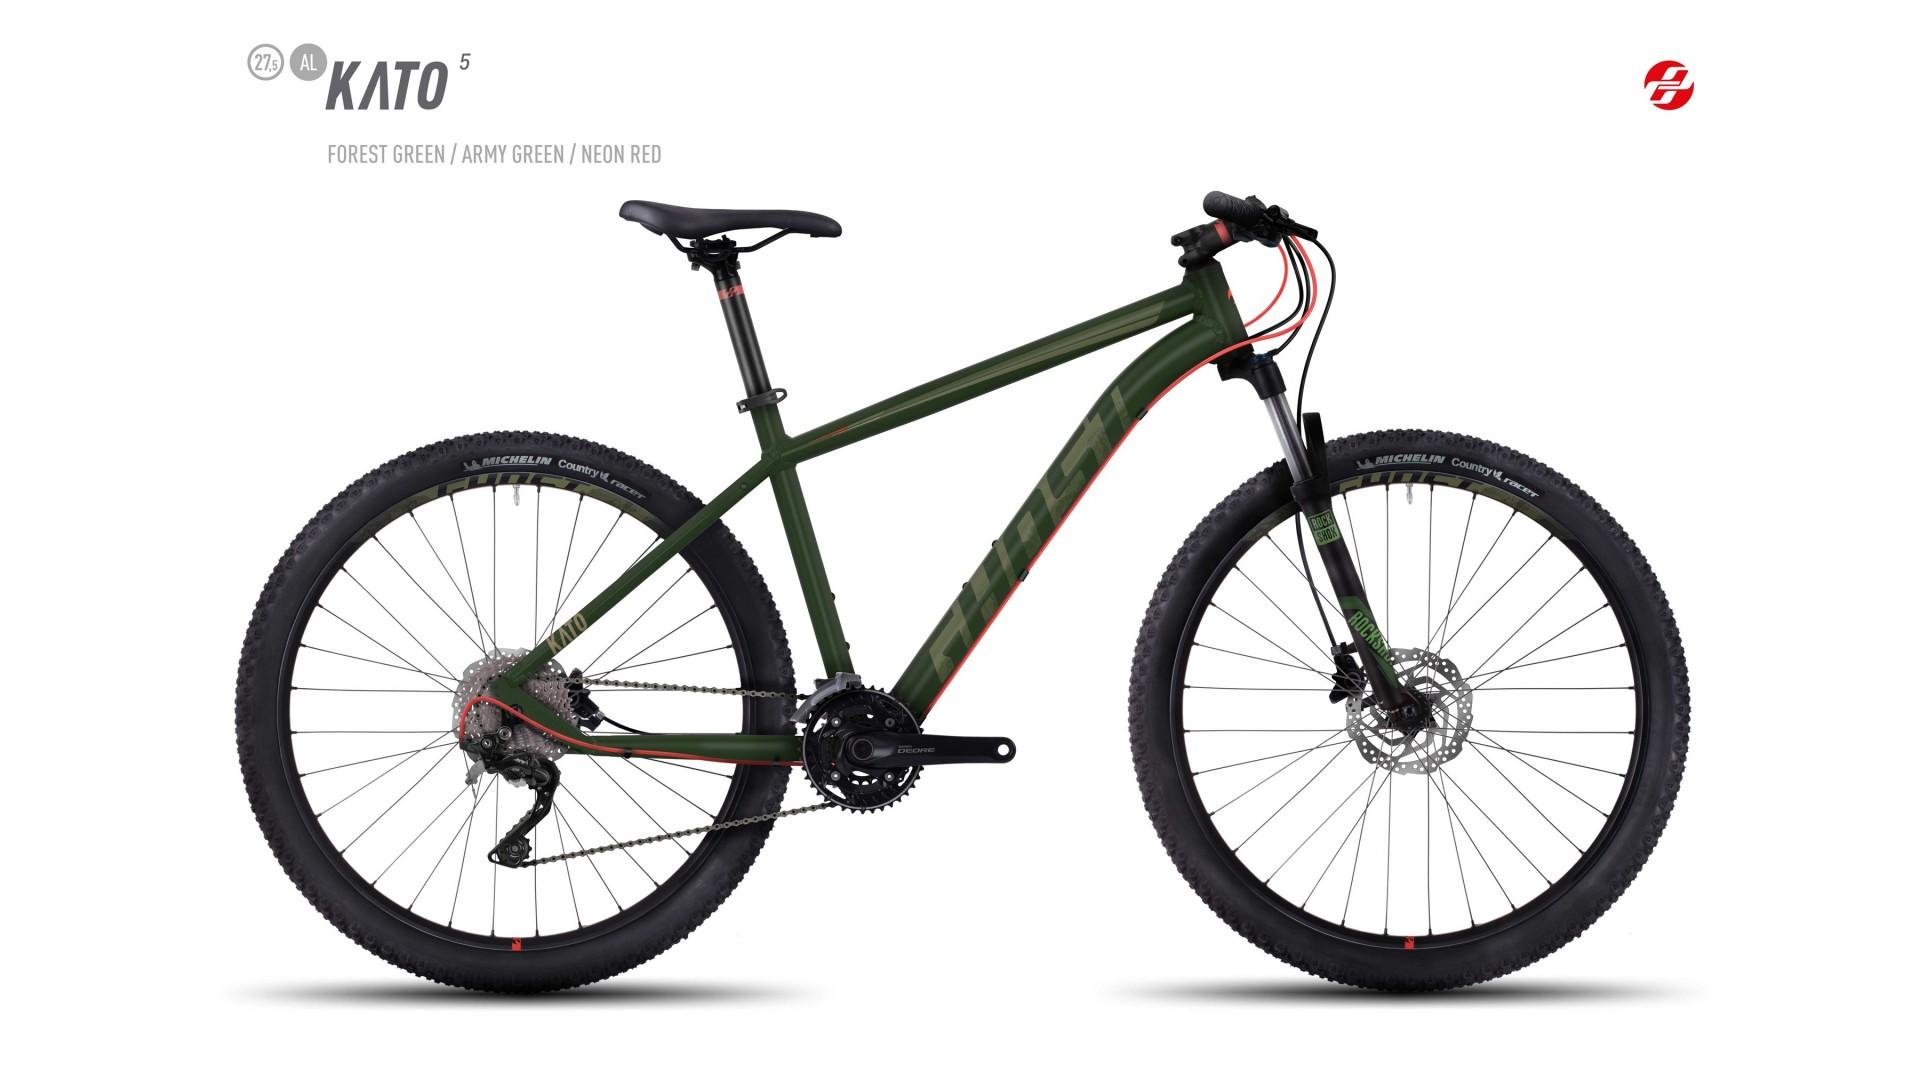 Велосипед GHOST Kato 5 AL 27.5 forestgreen/armygreen/neonred год 2017